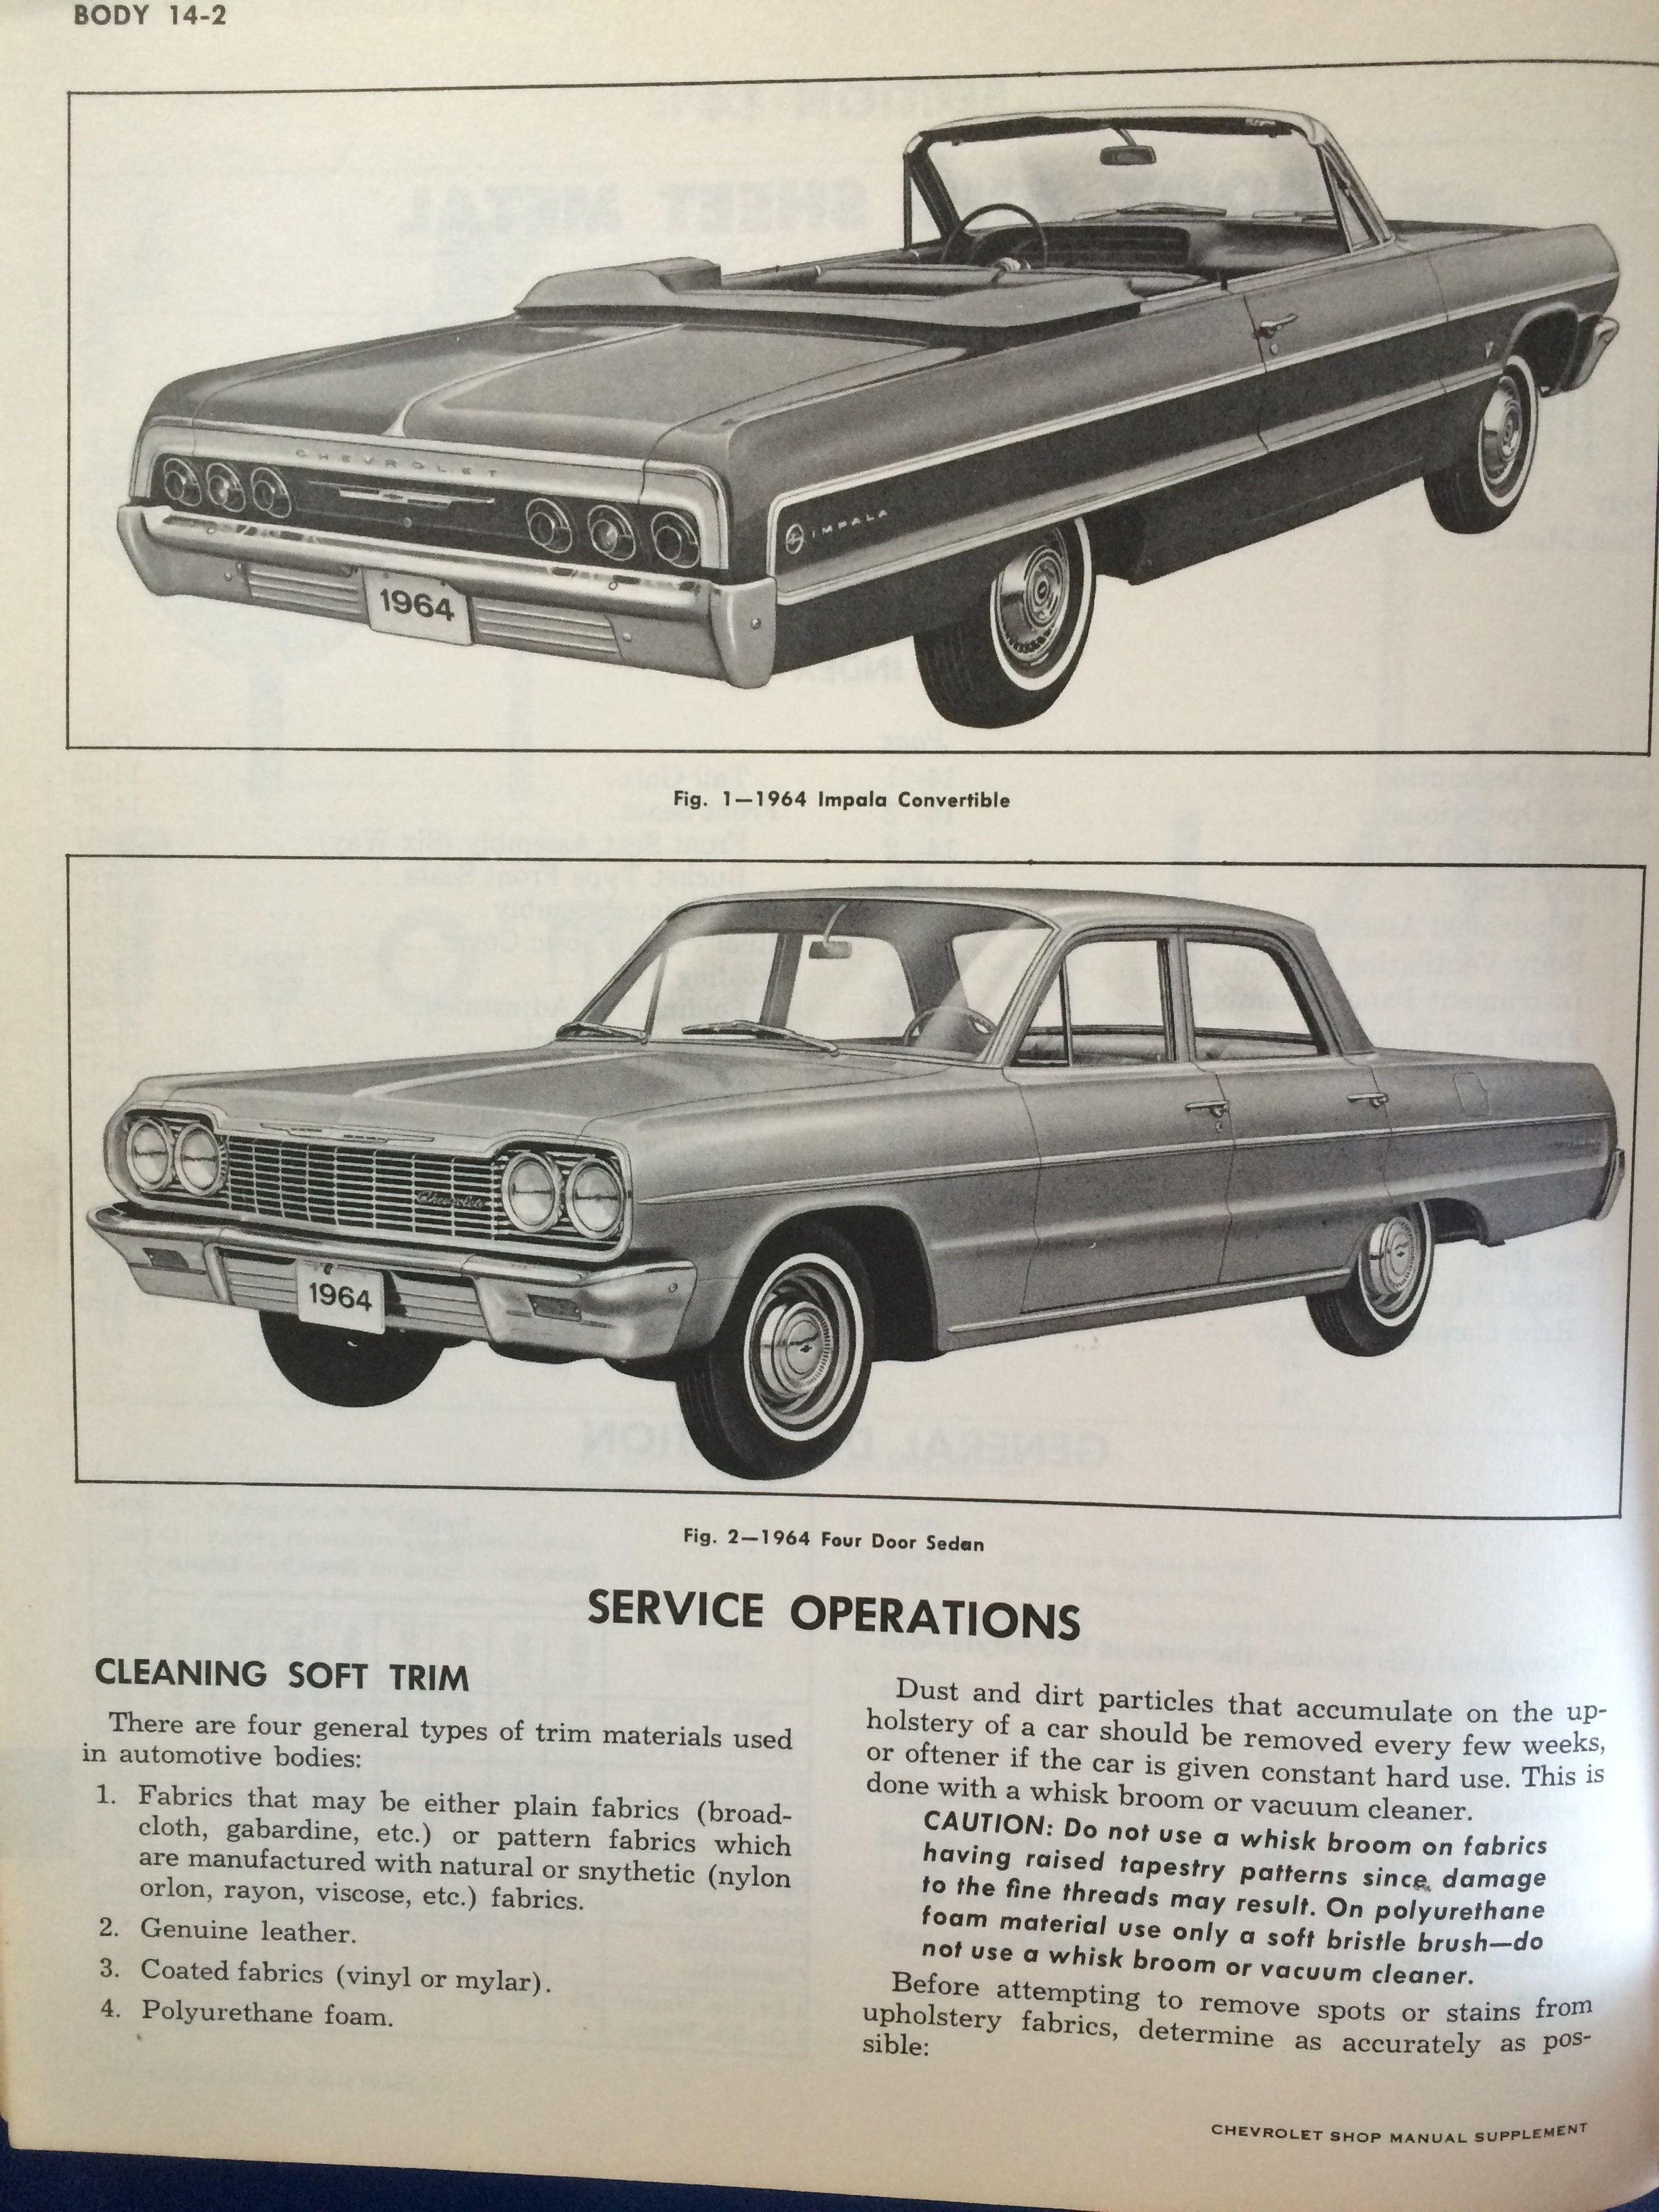 ... Array - 64 chevrolet full size shop manual impala pinterest chevrolet  rh ...